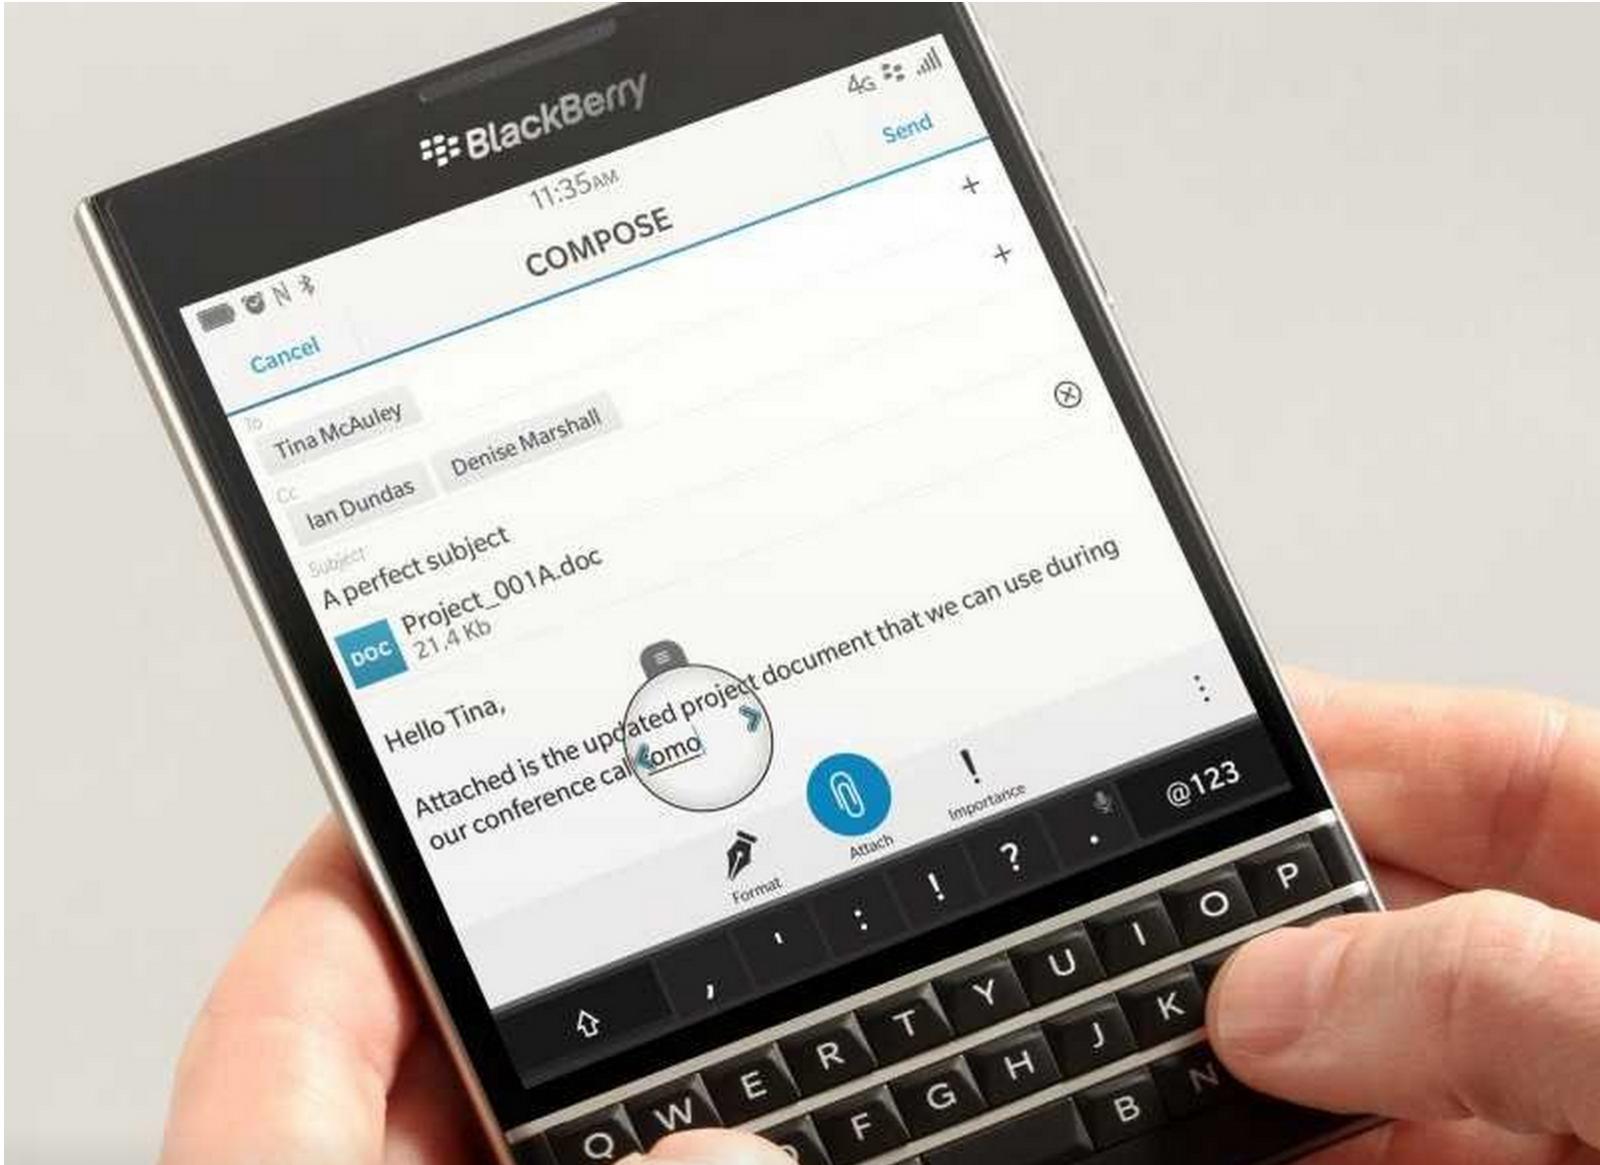 BlackBerry Passport Launched